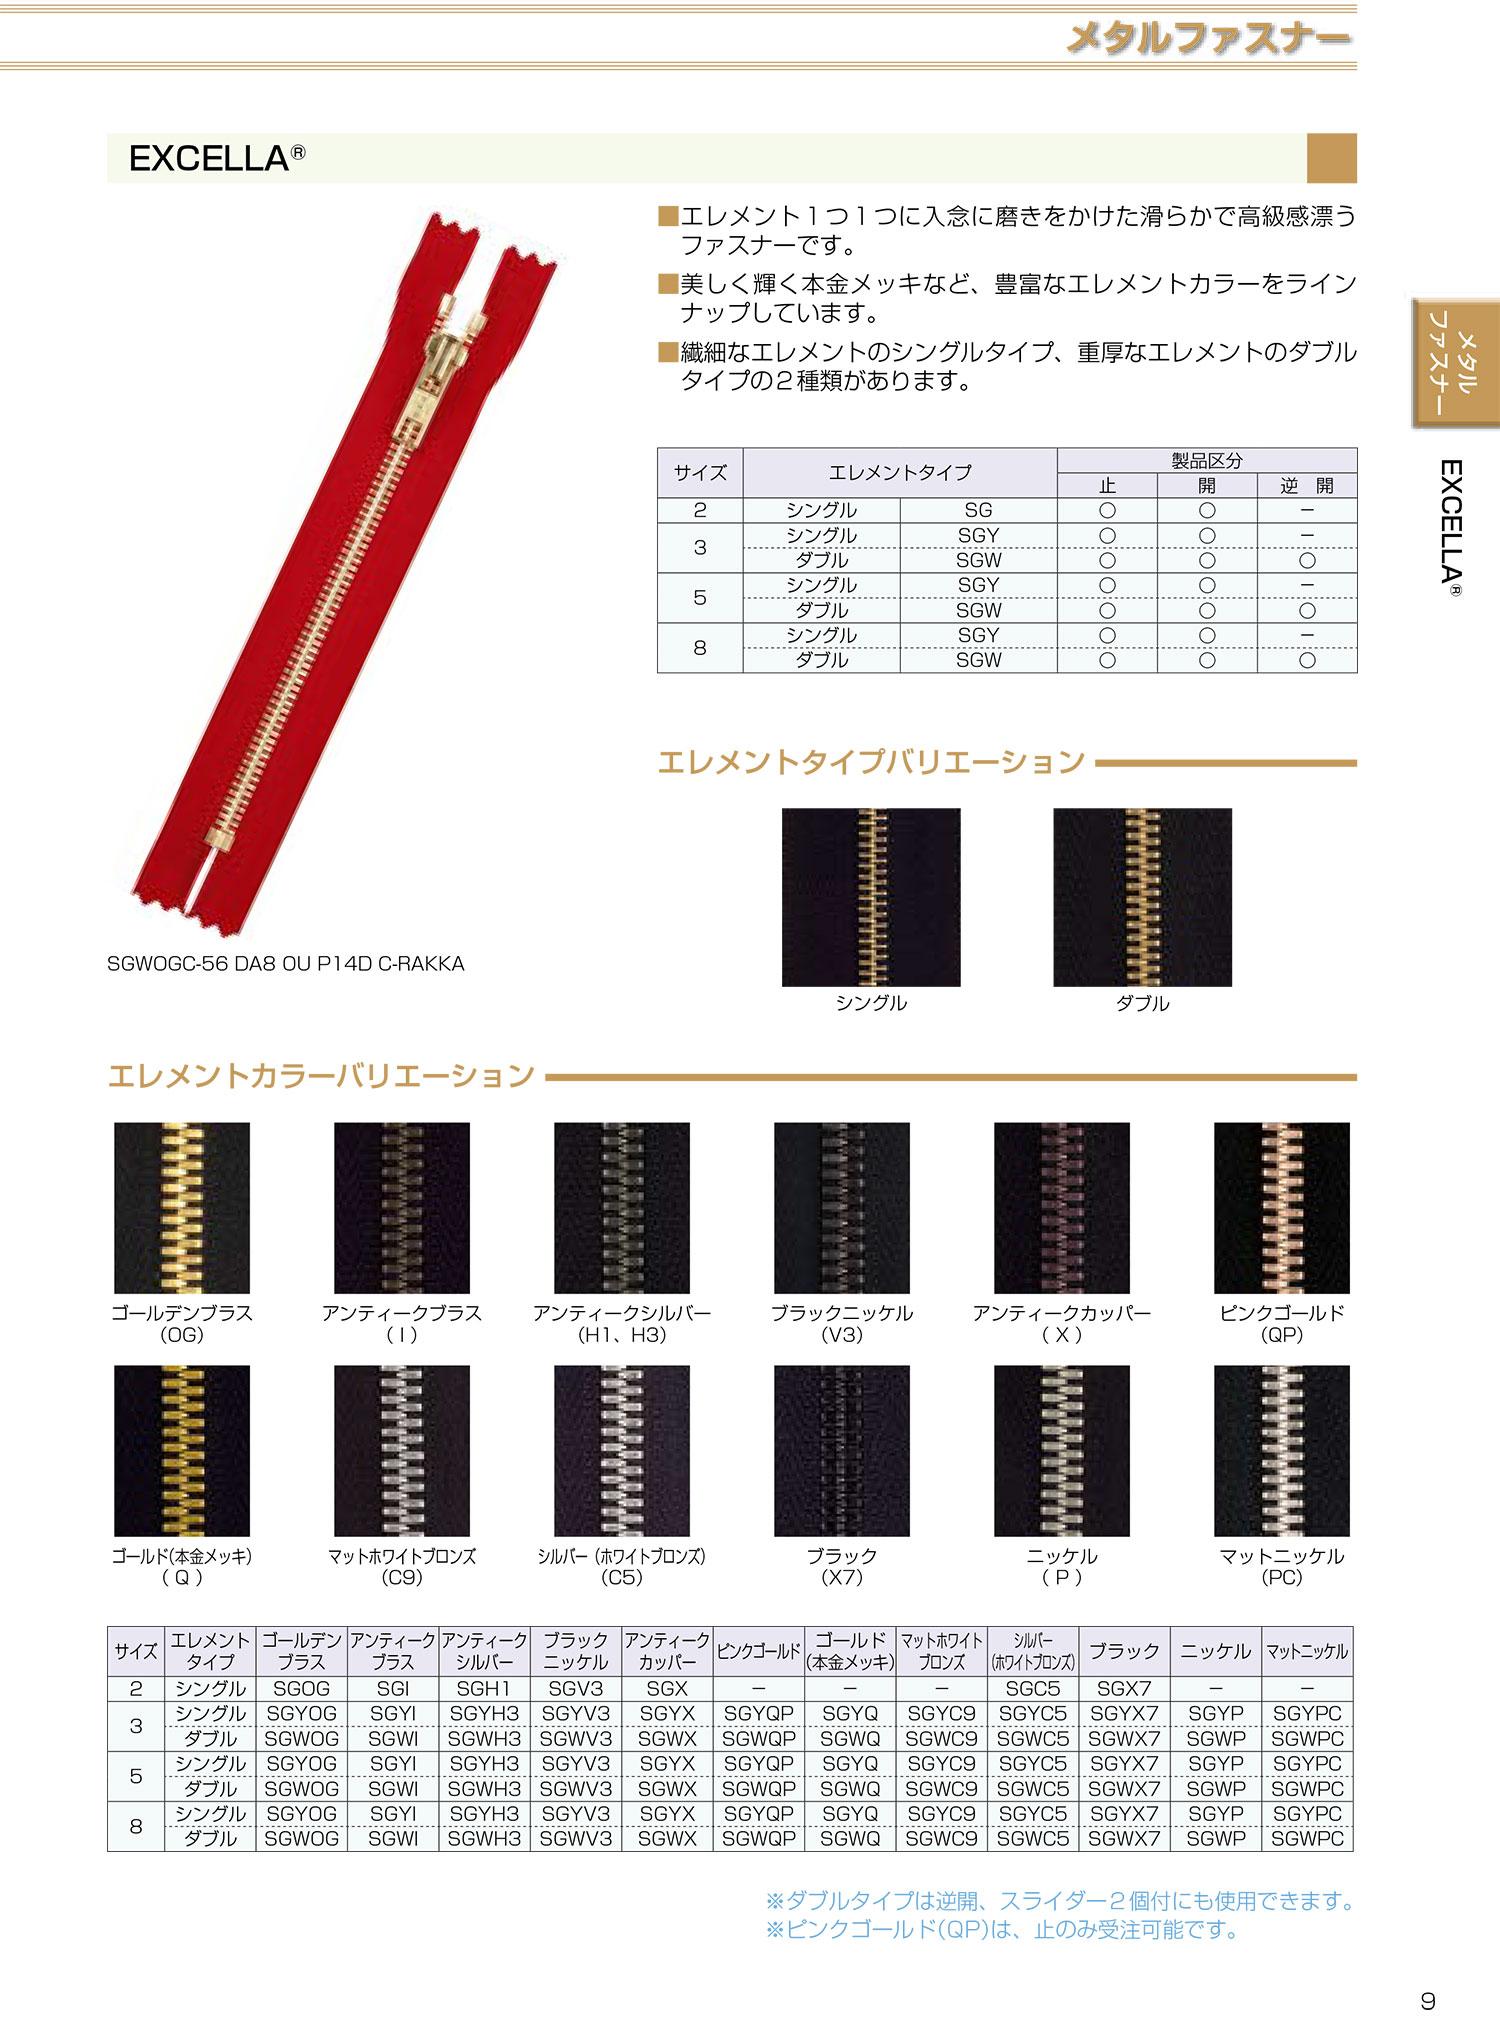 5SGWQMR エクセラ 5サイズ ゴールド(本金) 逆開 ダブル[ファスナー] YKK/オークラ商事 - ApparelX アパレル資材卸通販